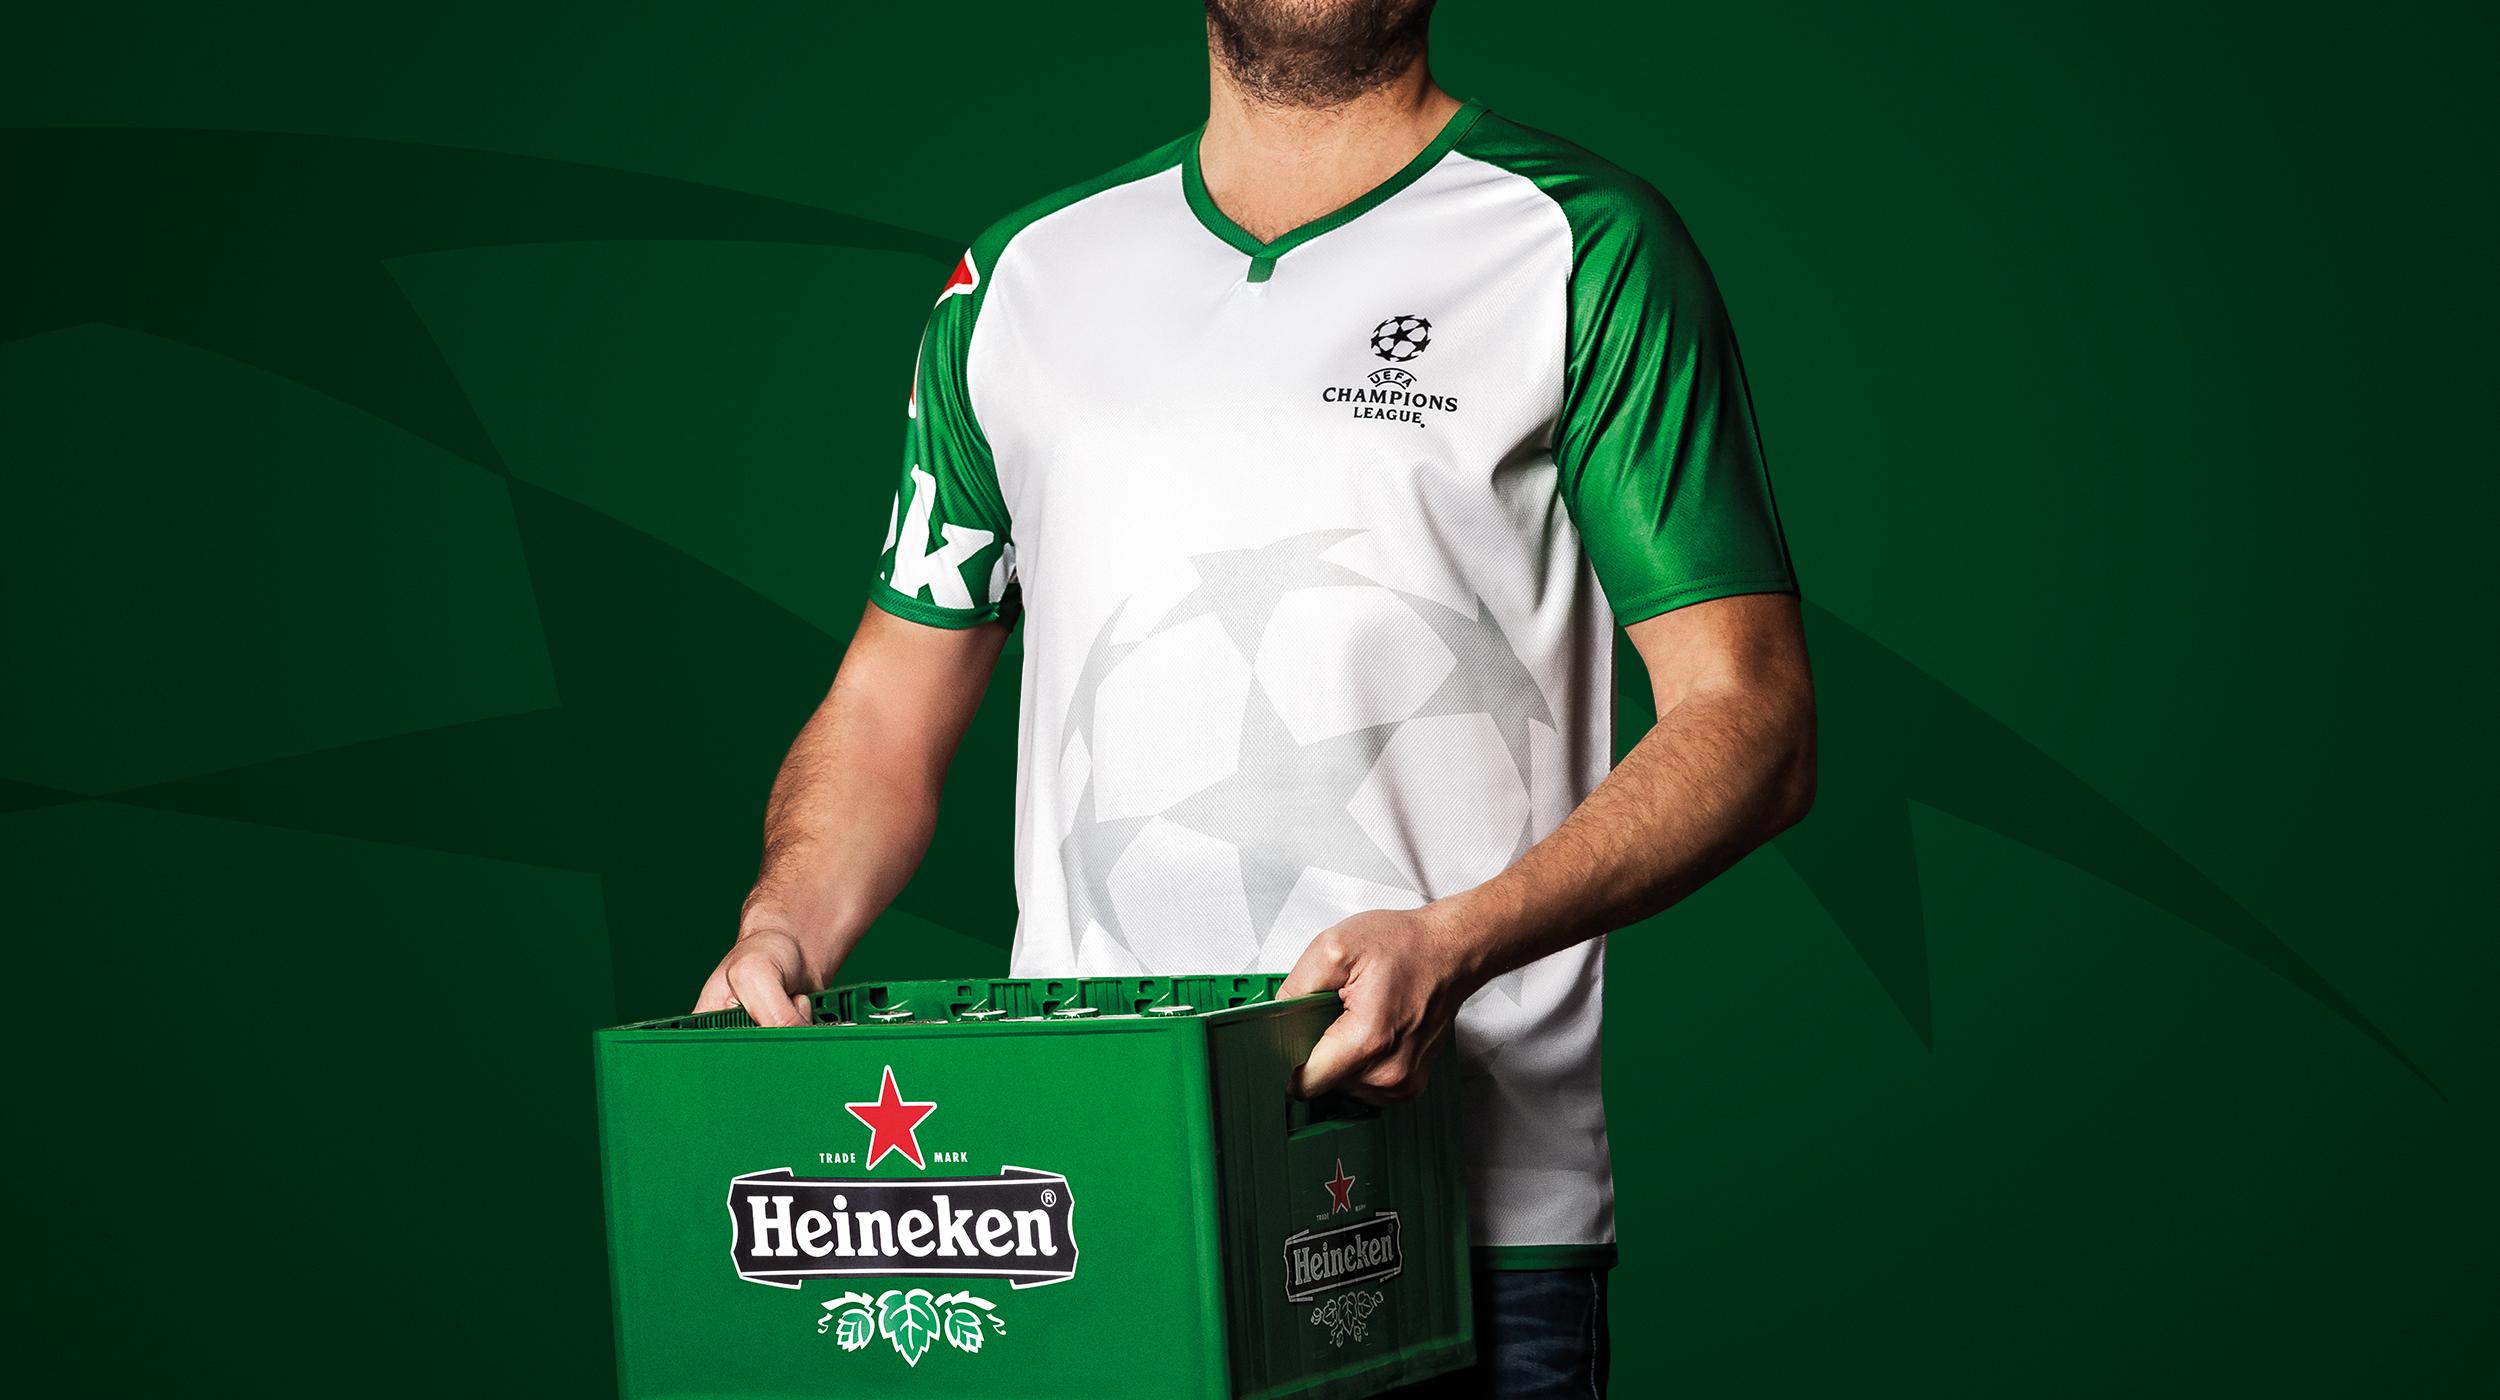 Heineken-UEFA-Champions-League